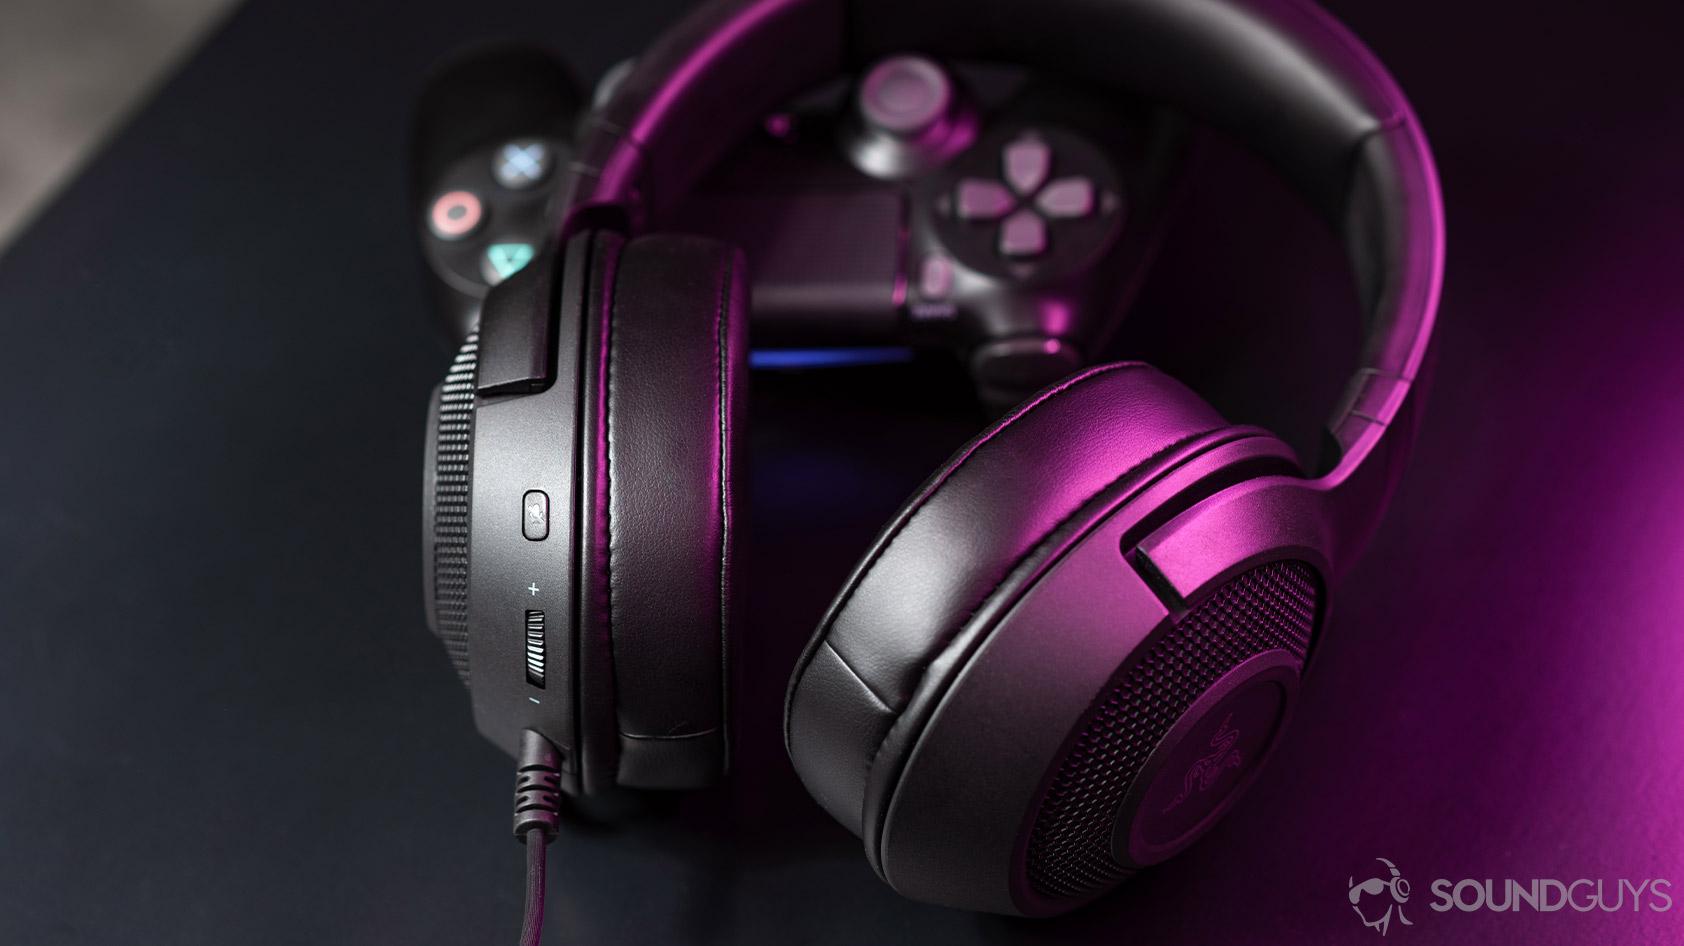 Razer Kraken X review - SoundGuys